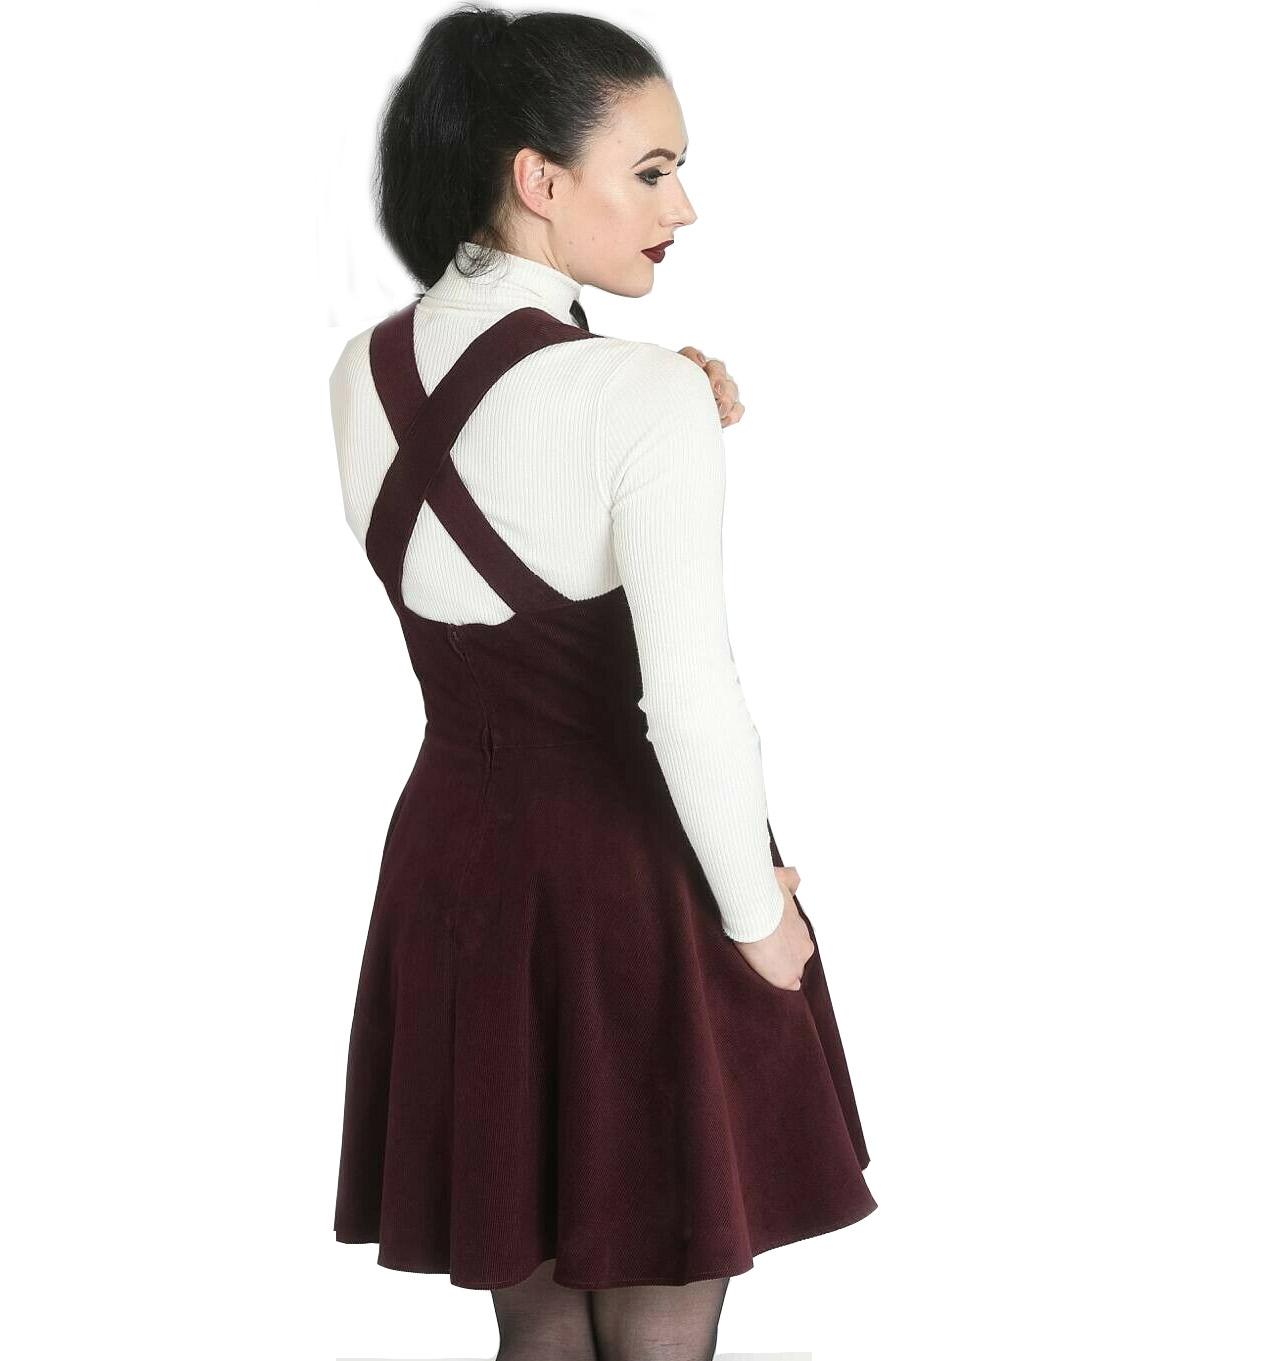 Hell-Bunny-Rockabilly-Corduroy-Mini-Dress-WONDER-YEARS-Pinafore-Wine-All-Sizes thumbnail 25